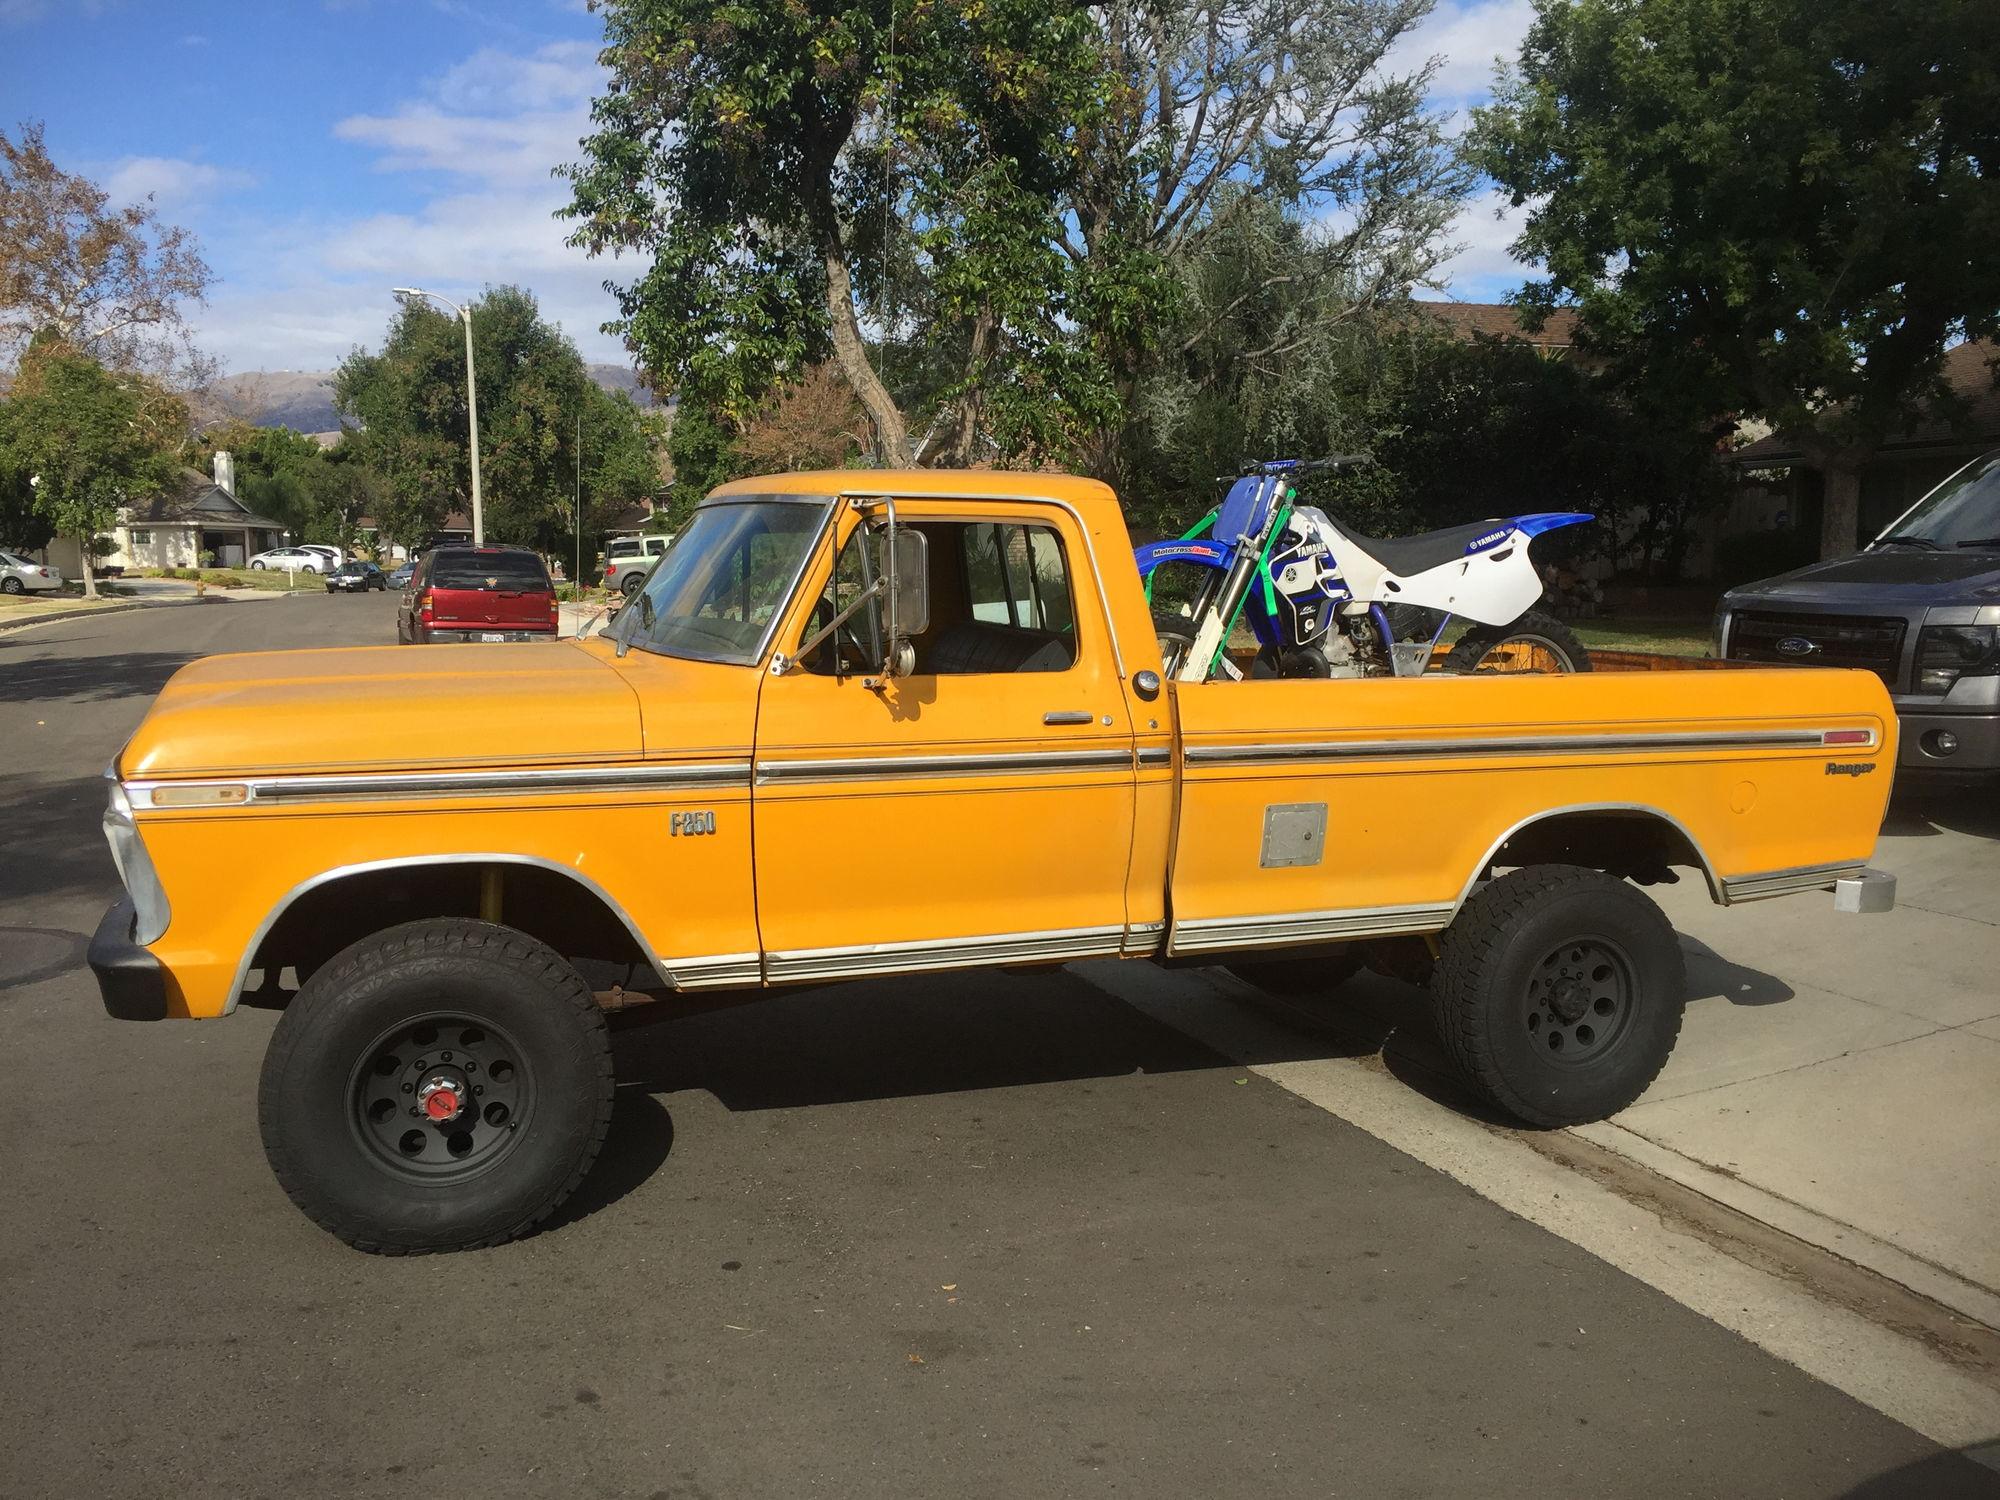 79 Chevy Cheyenne Starter Wiring Diagram Truck For Best Librarychevy Location